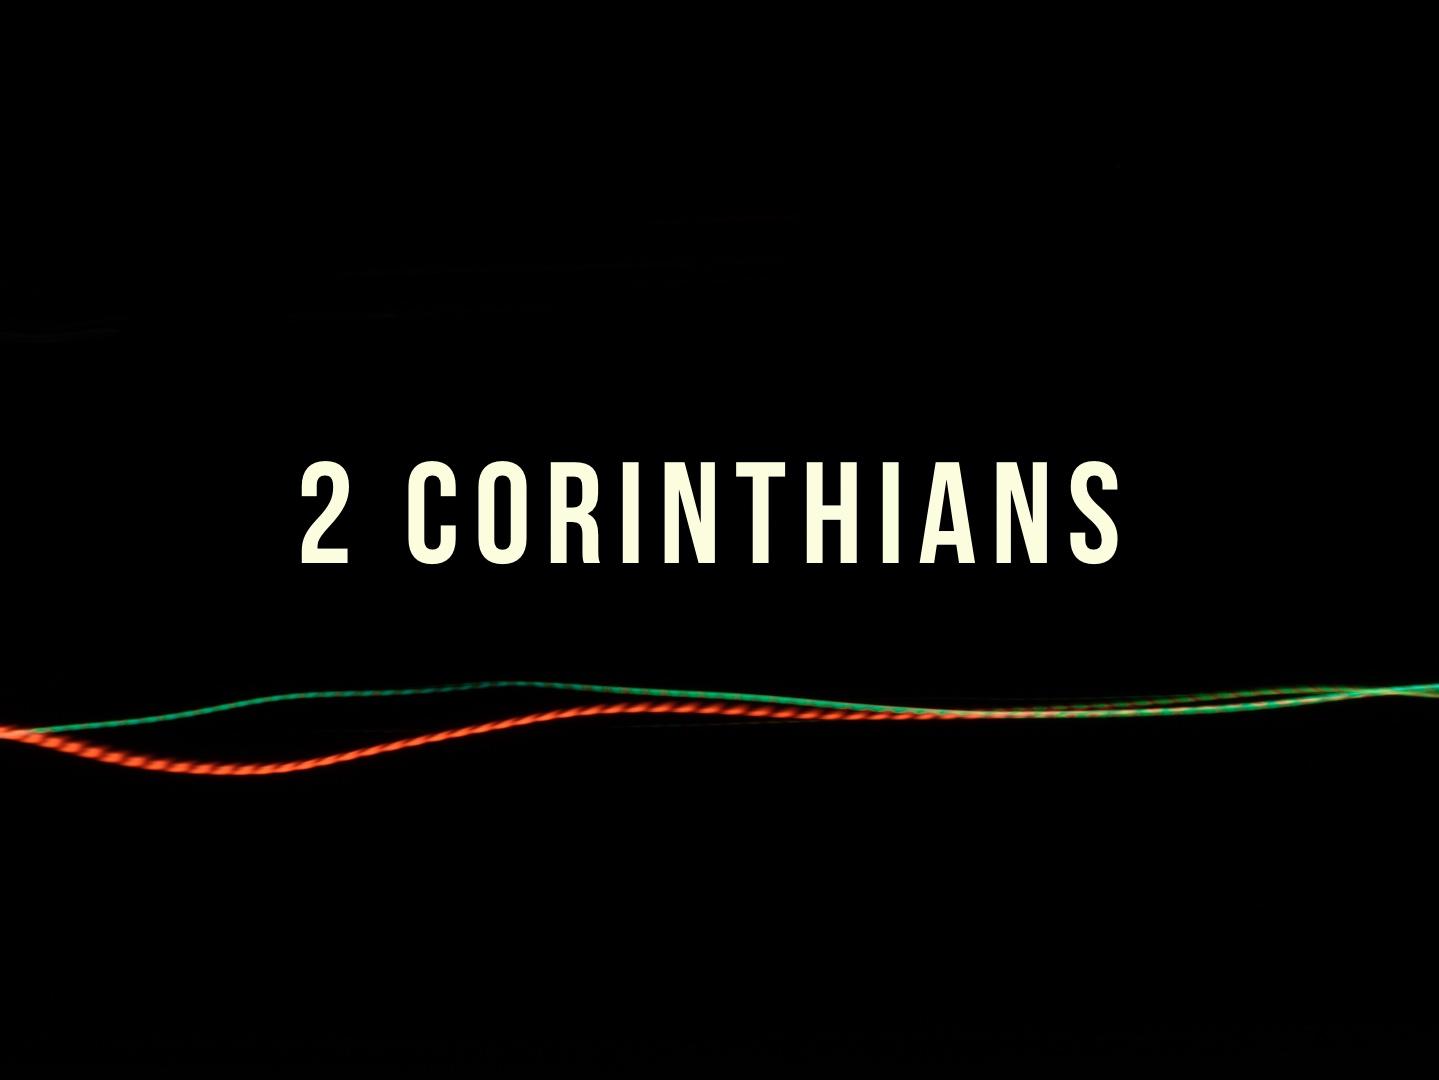 2 Corinthians banner